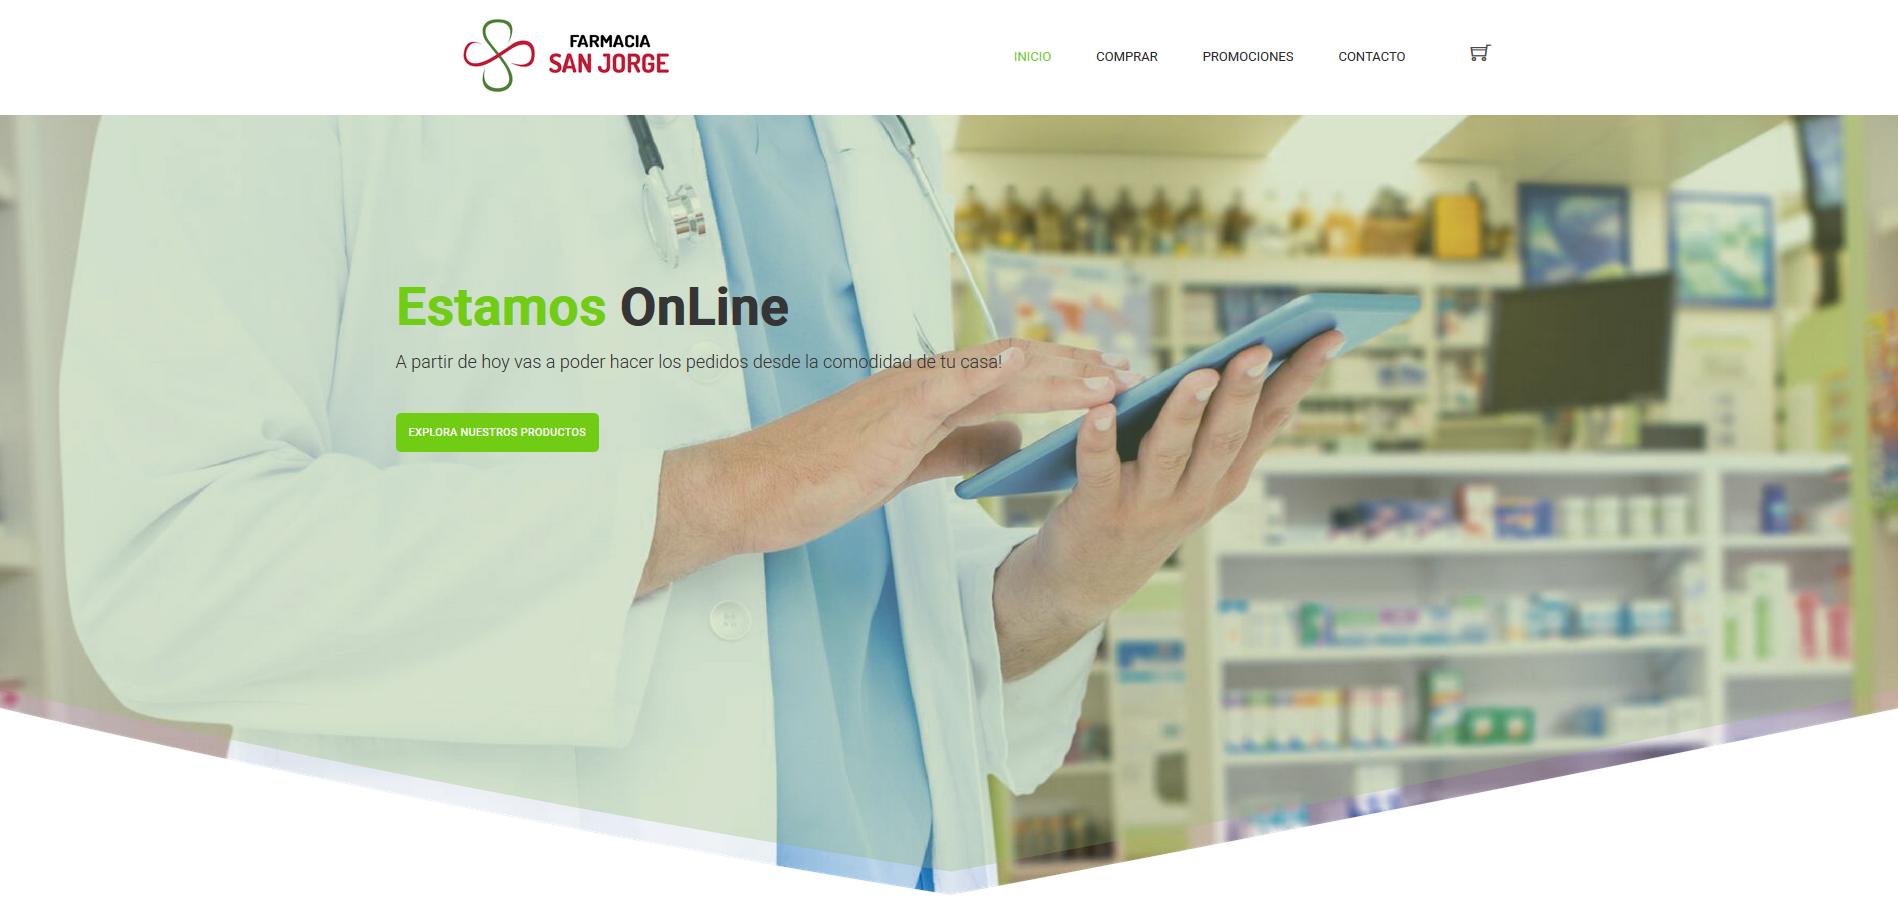 Farmacia San Jorge